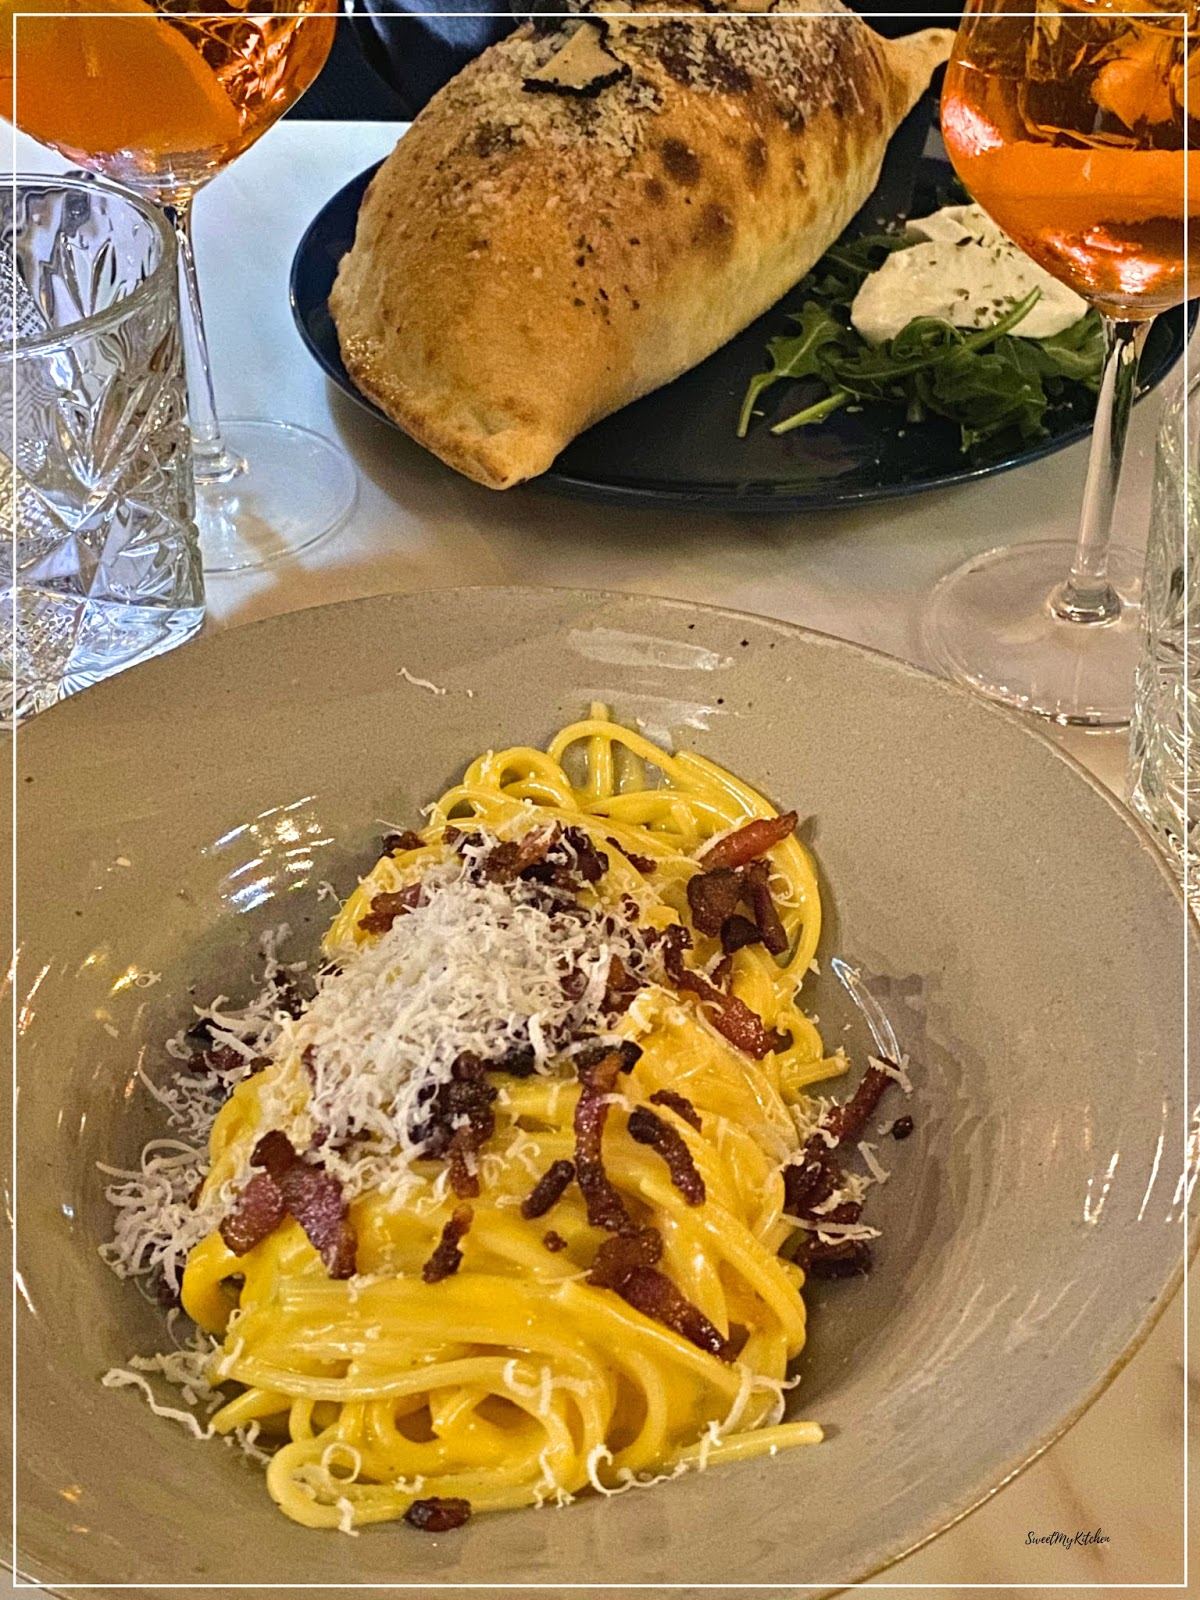 Visconti Chiado restaurante italiano Largo Rafaela Bordalo Pinheiro